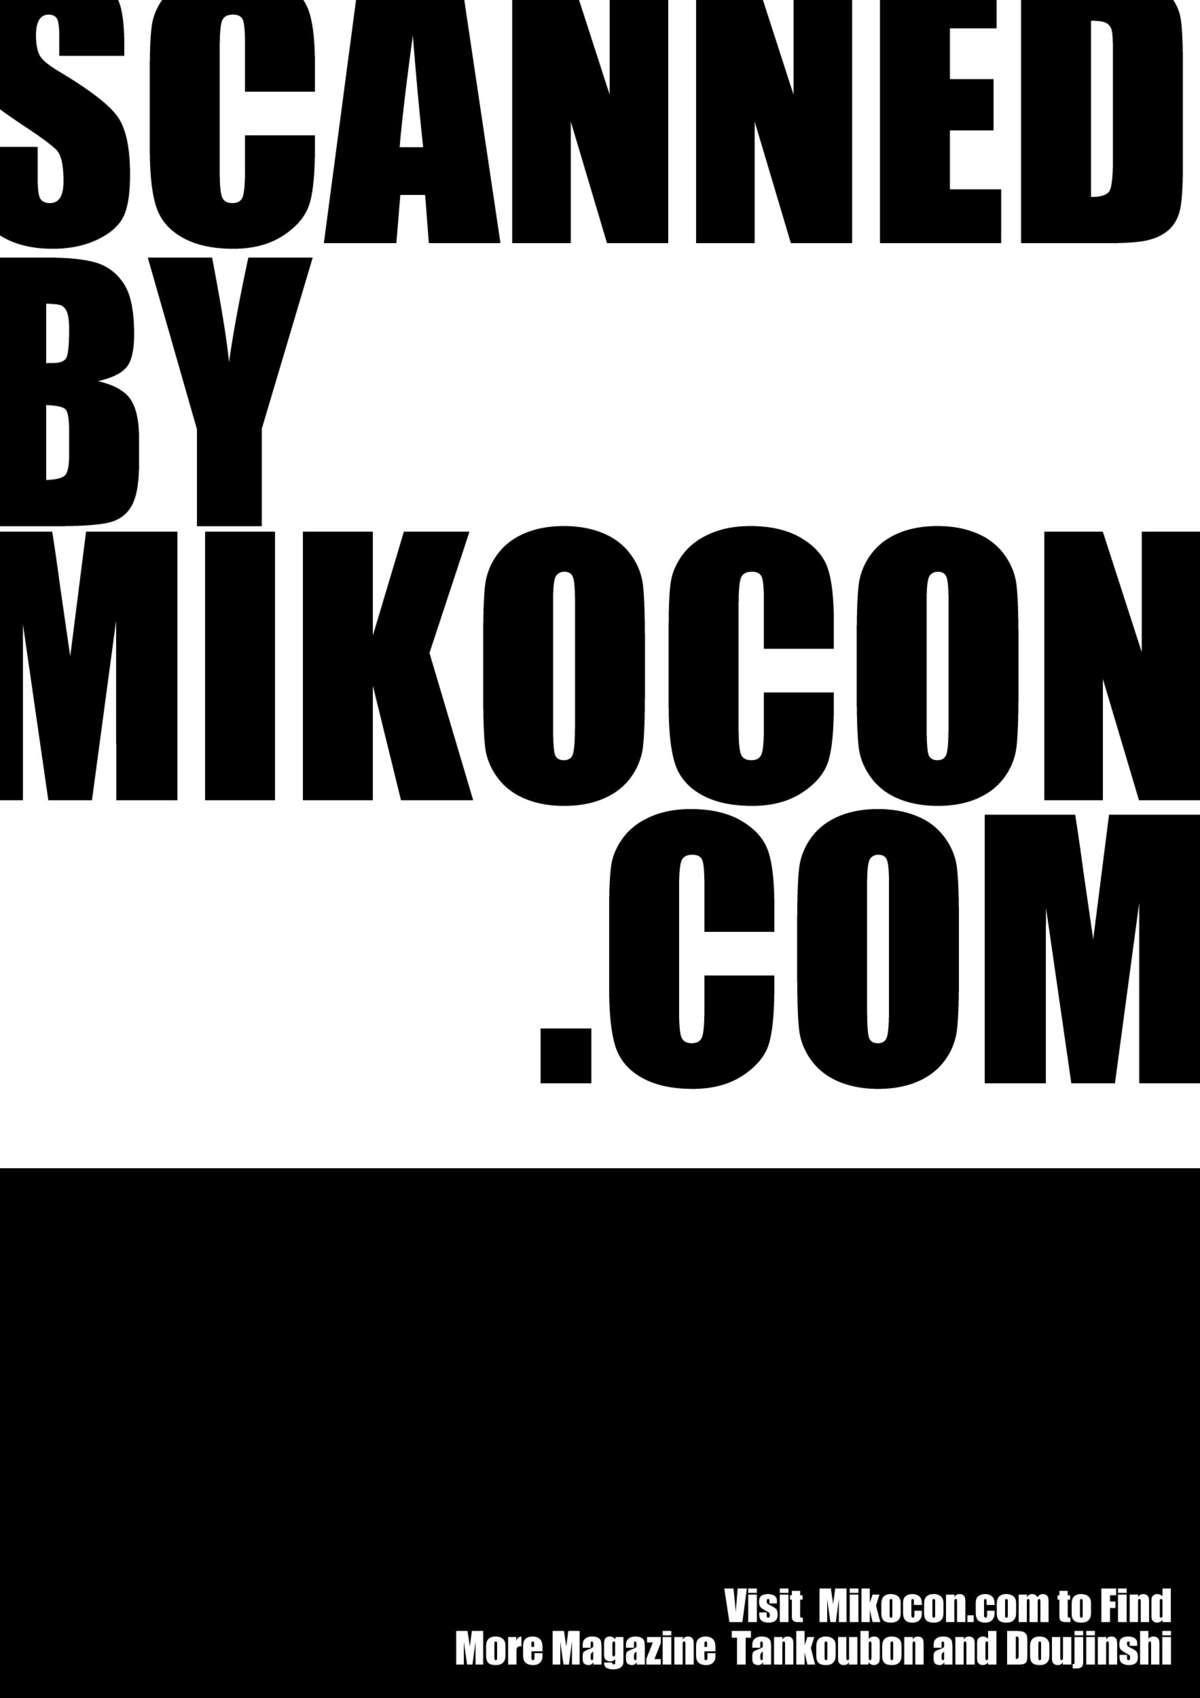 Monthly Vitaman 2016-03 253